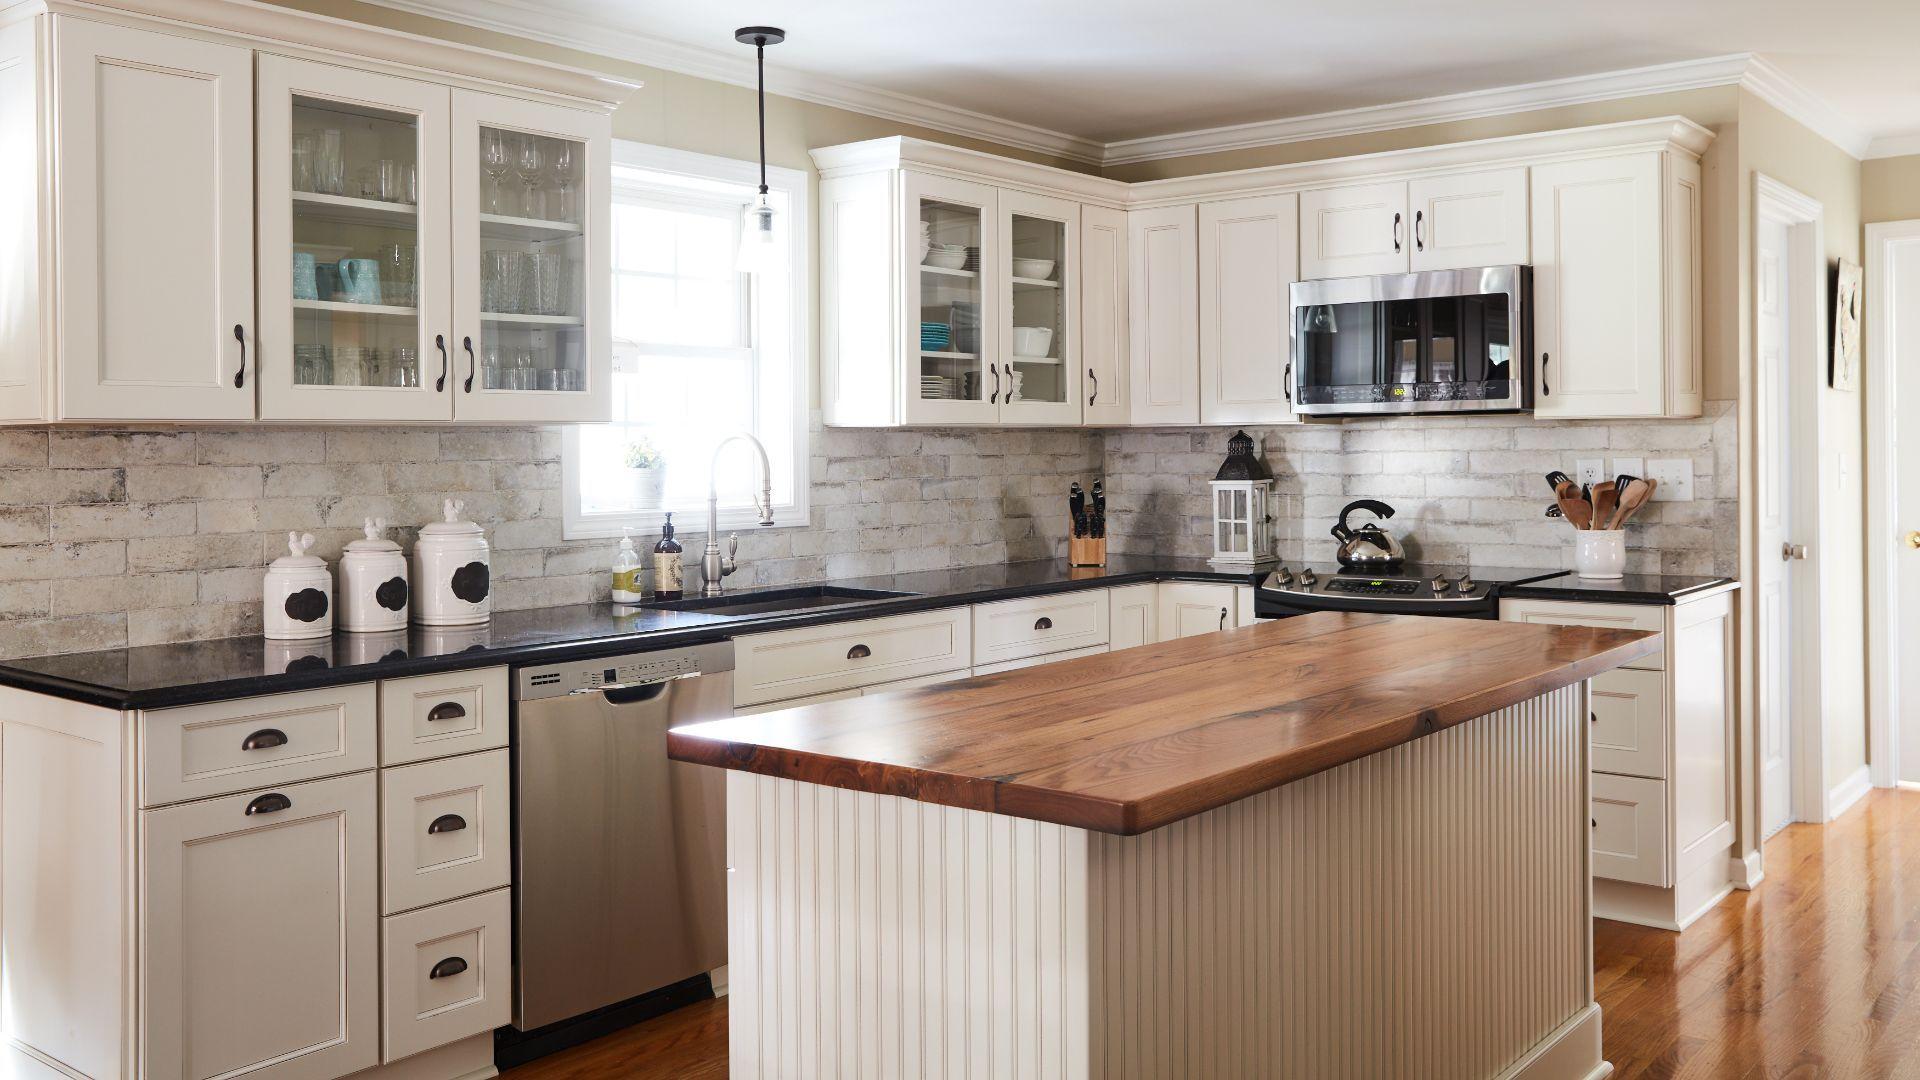 Fusion Blanc Fabuwood Cabinetry Kitchen Cabinets Decor Kitchen Cabinets Fabuwood Cabinets